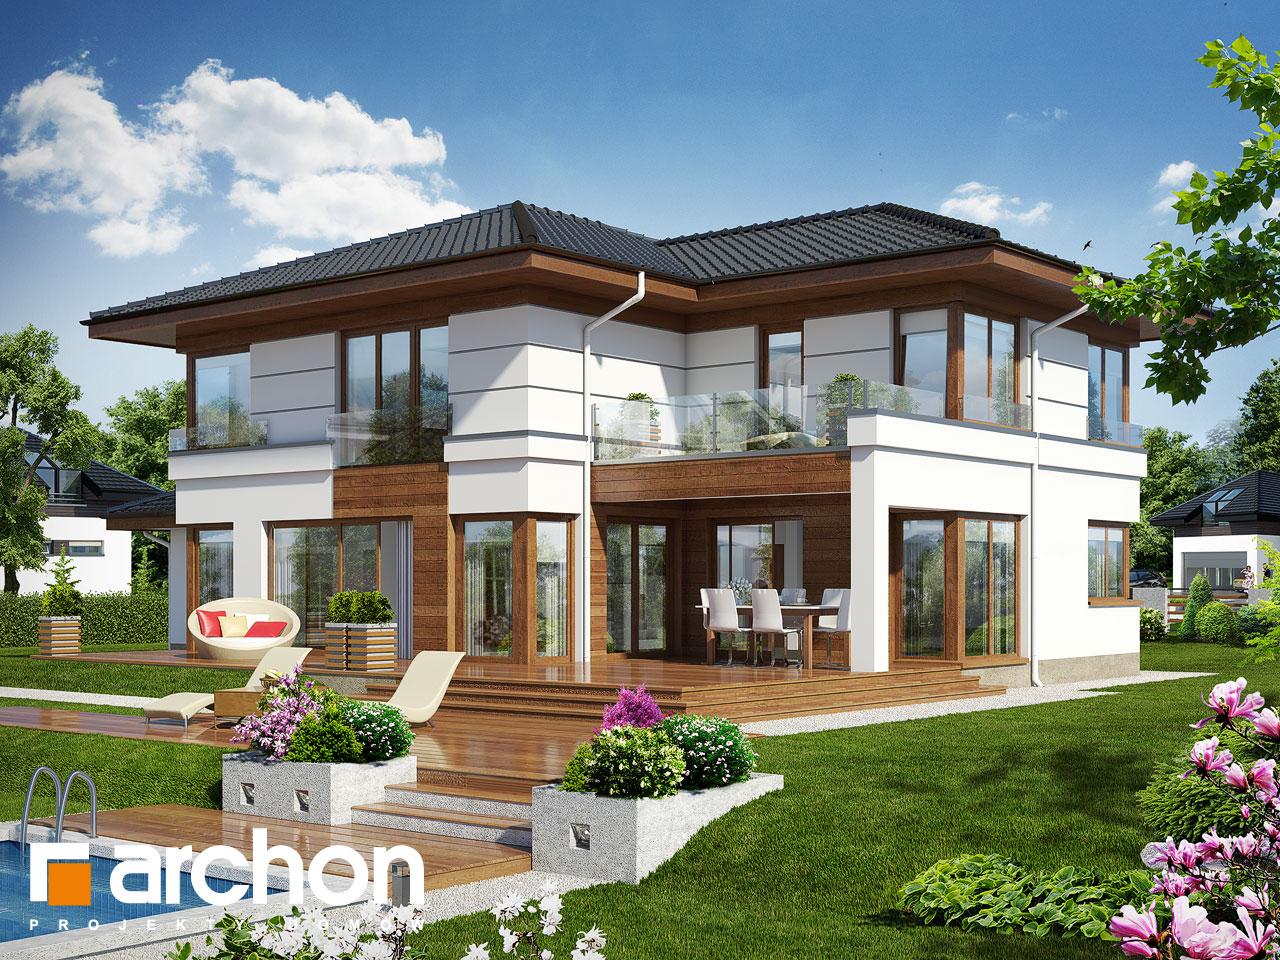 Projekt domu willa weronika 3 archon for Mini casas modernas